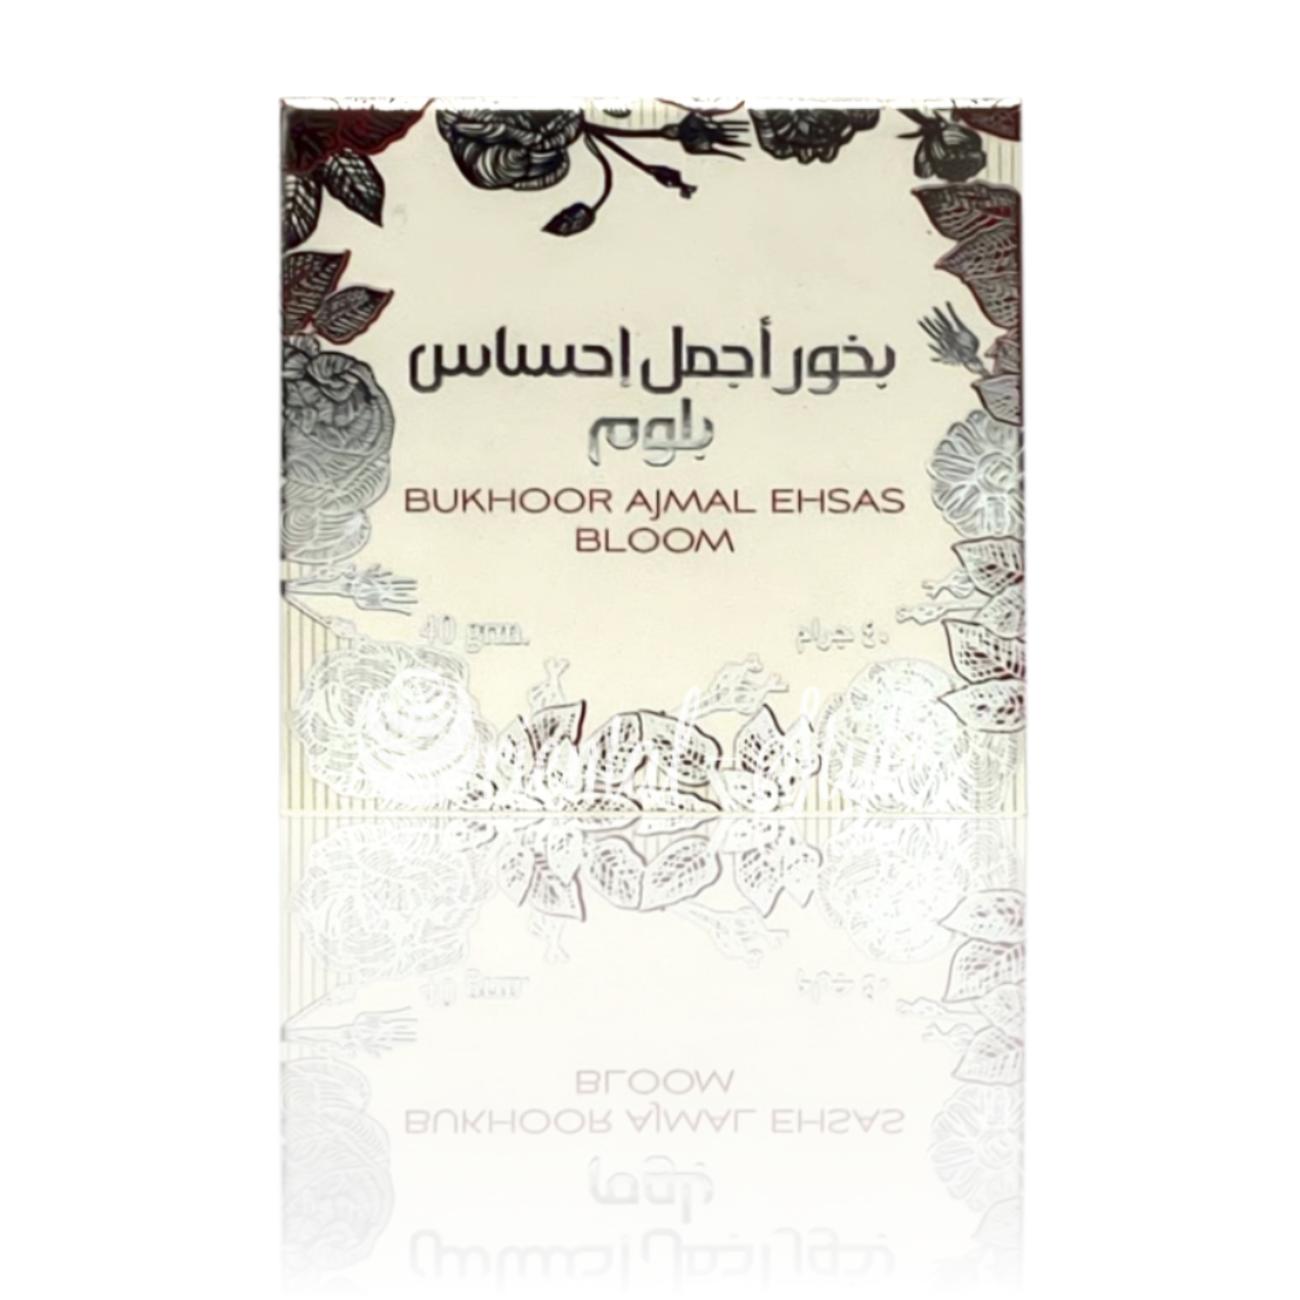 Räuchern mit Bukhoor Ajmal Ehsas Bloom